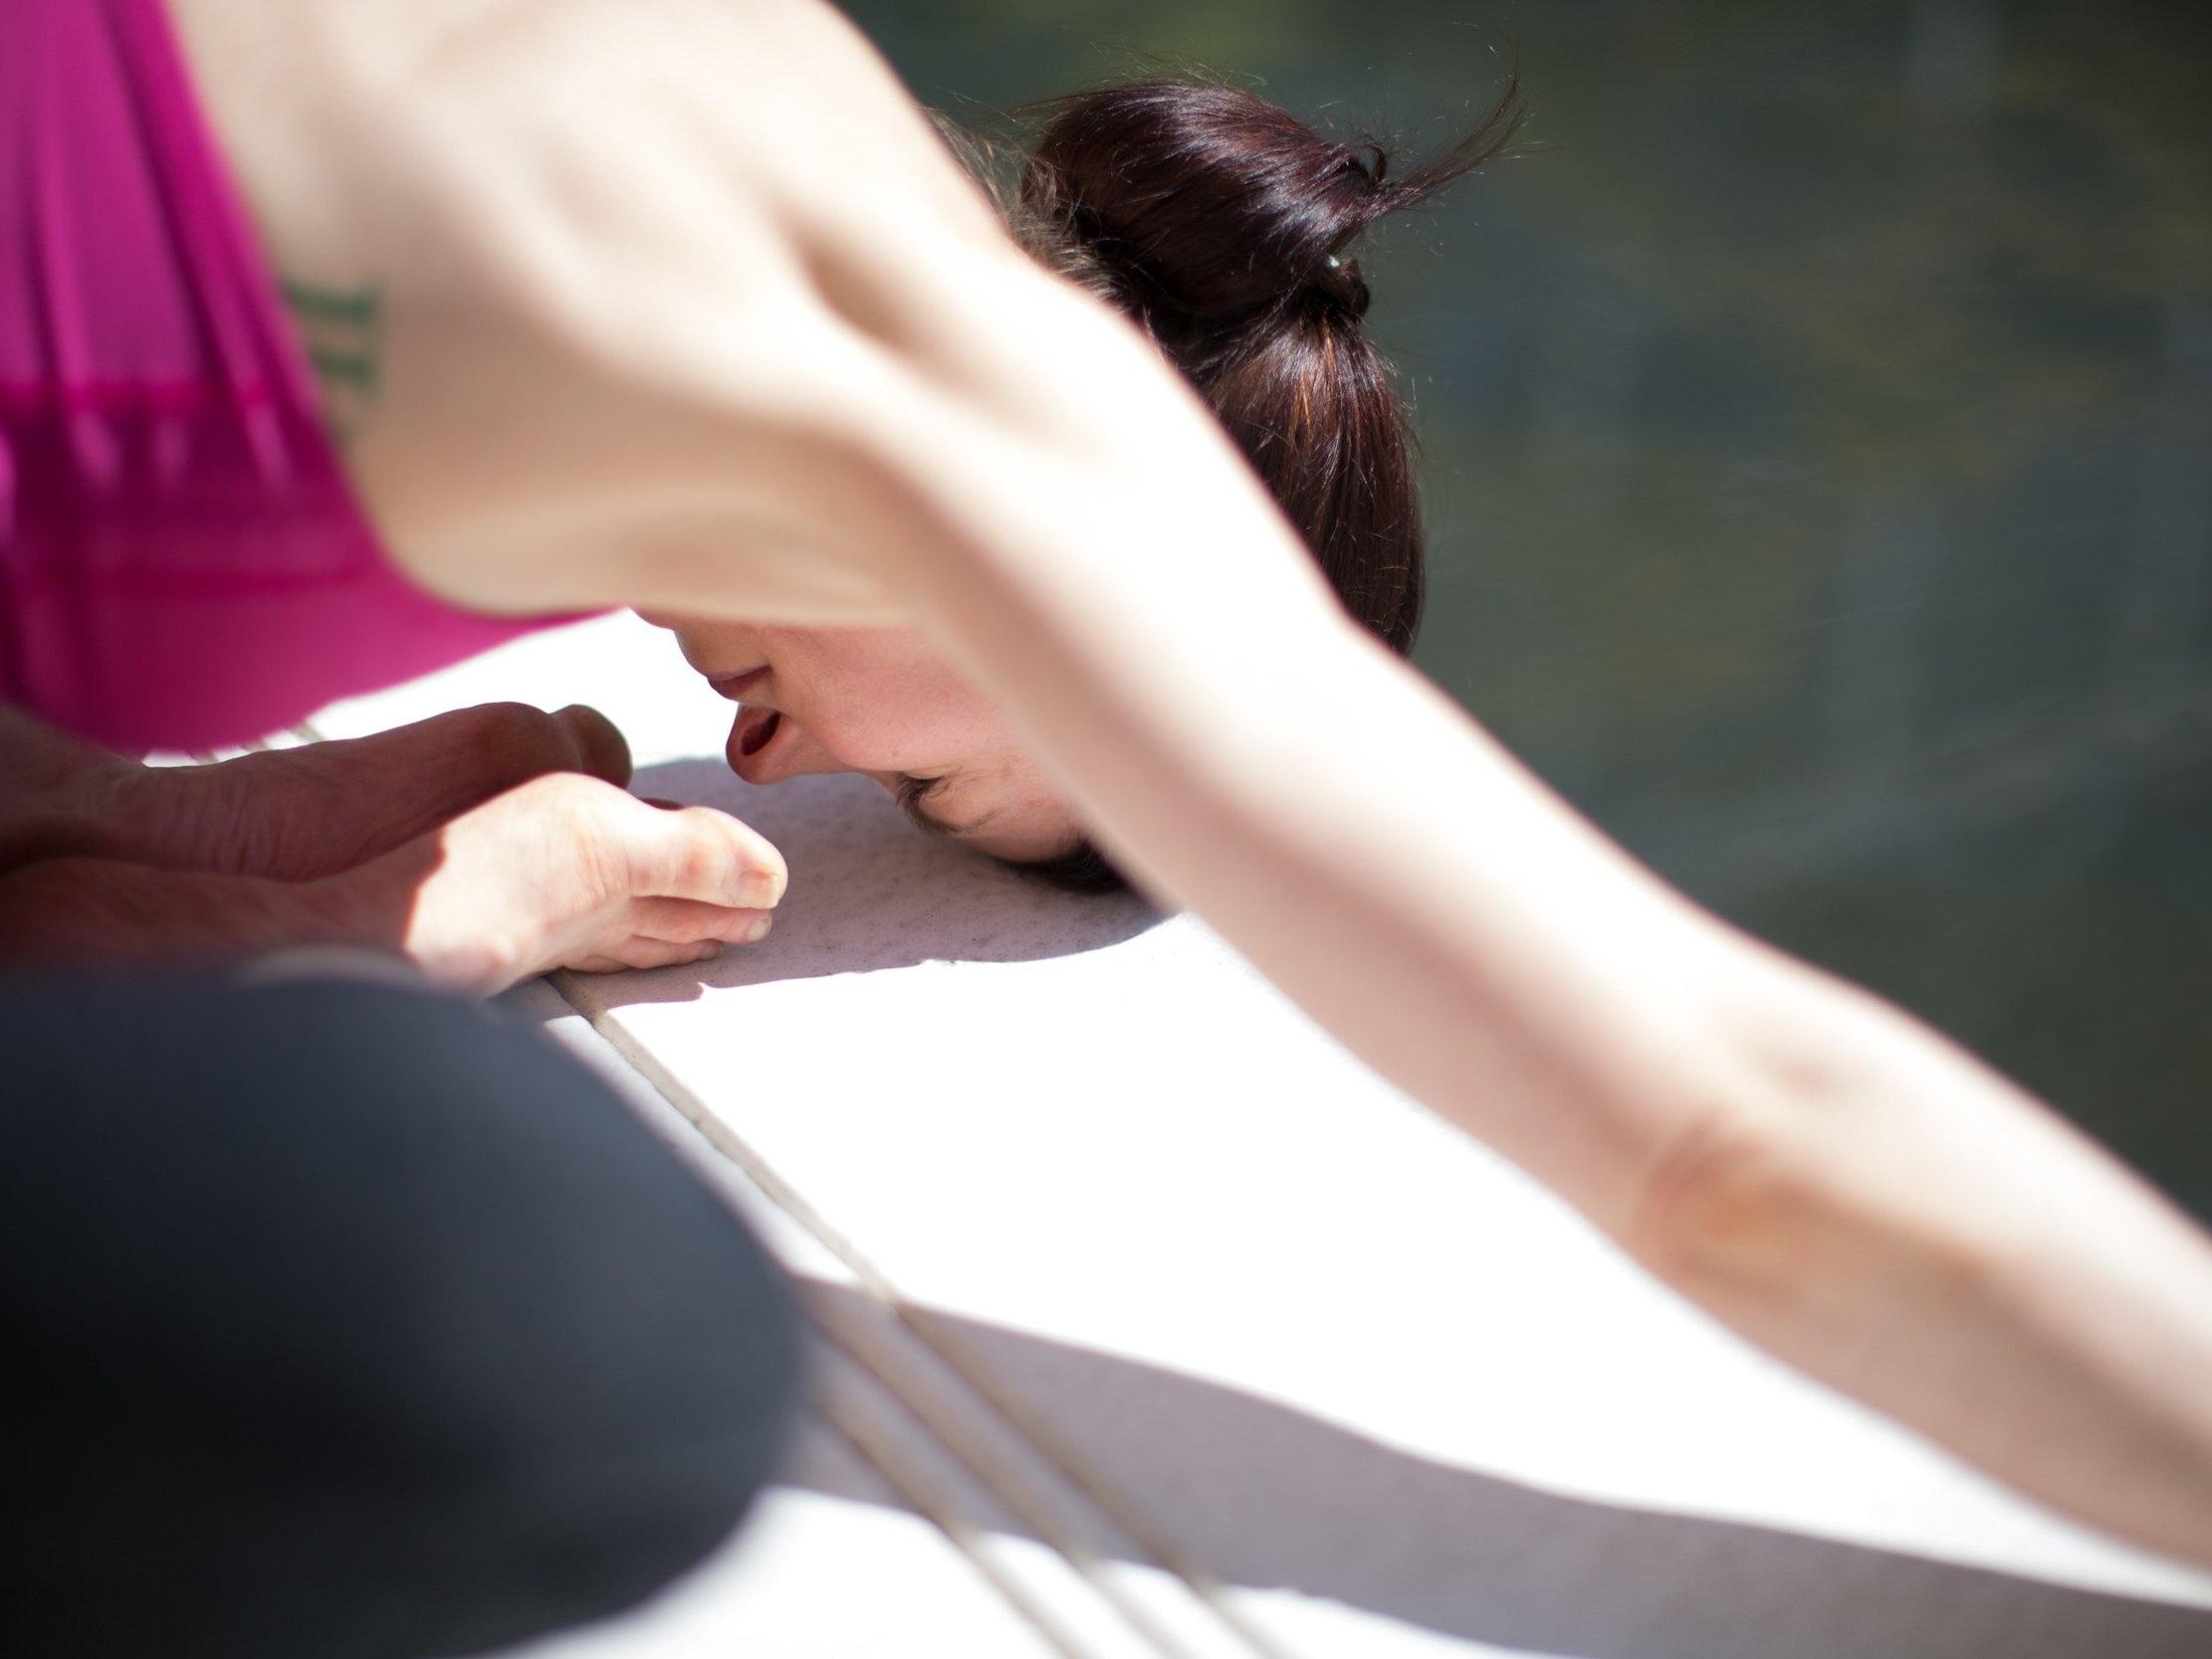 beautiful-exercise-female-268101.jpg